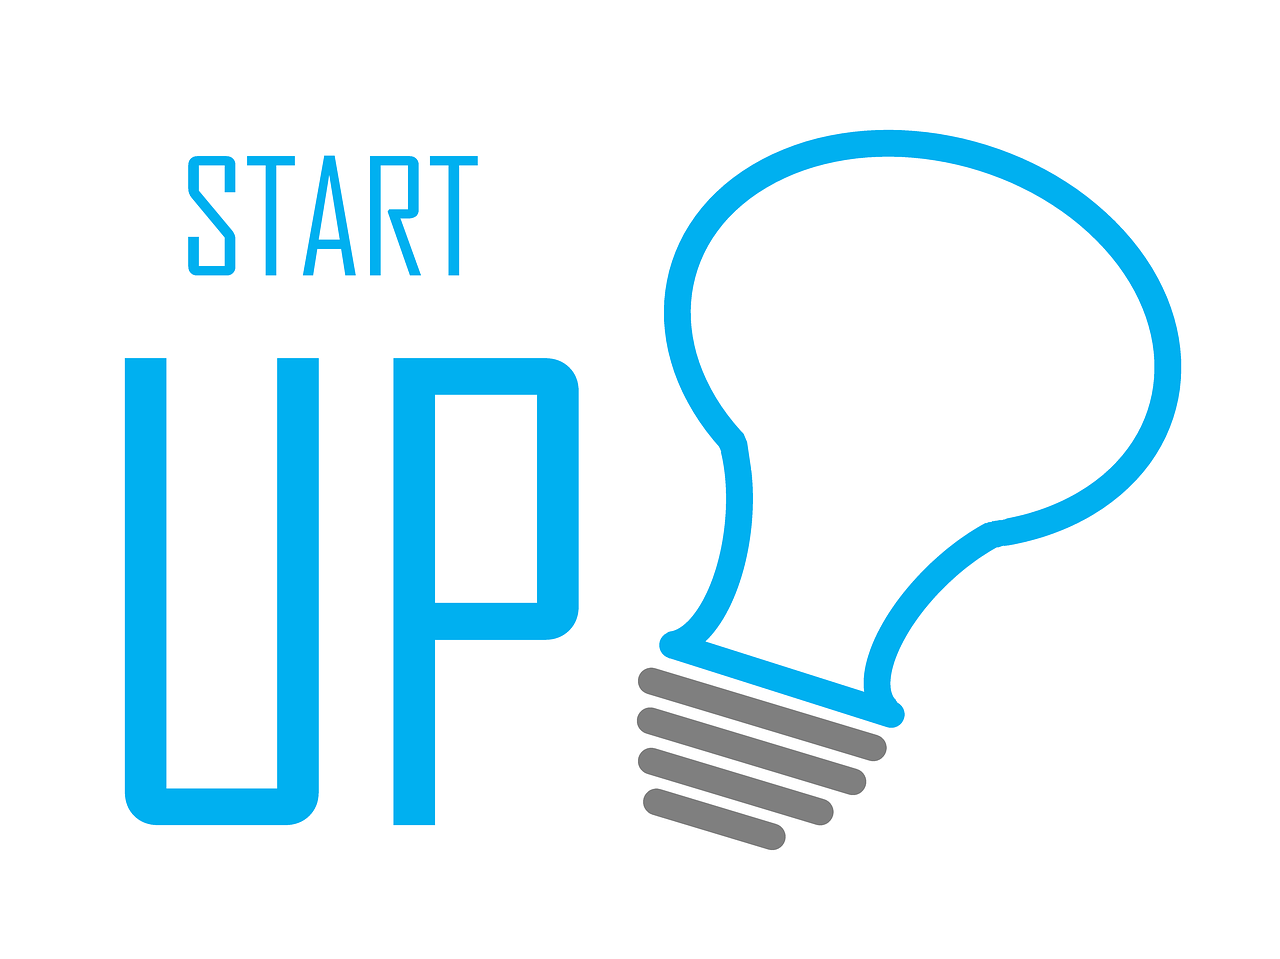 startup-1018514_1280